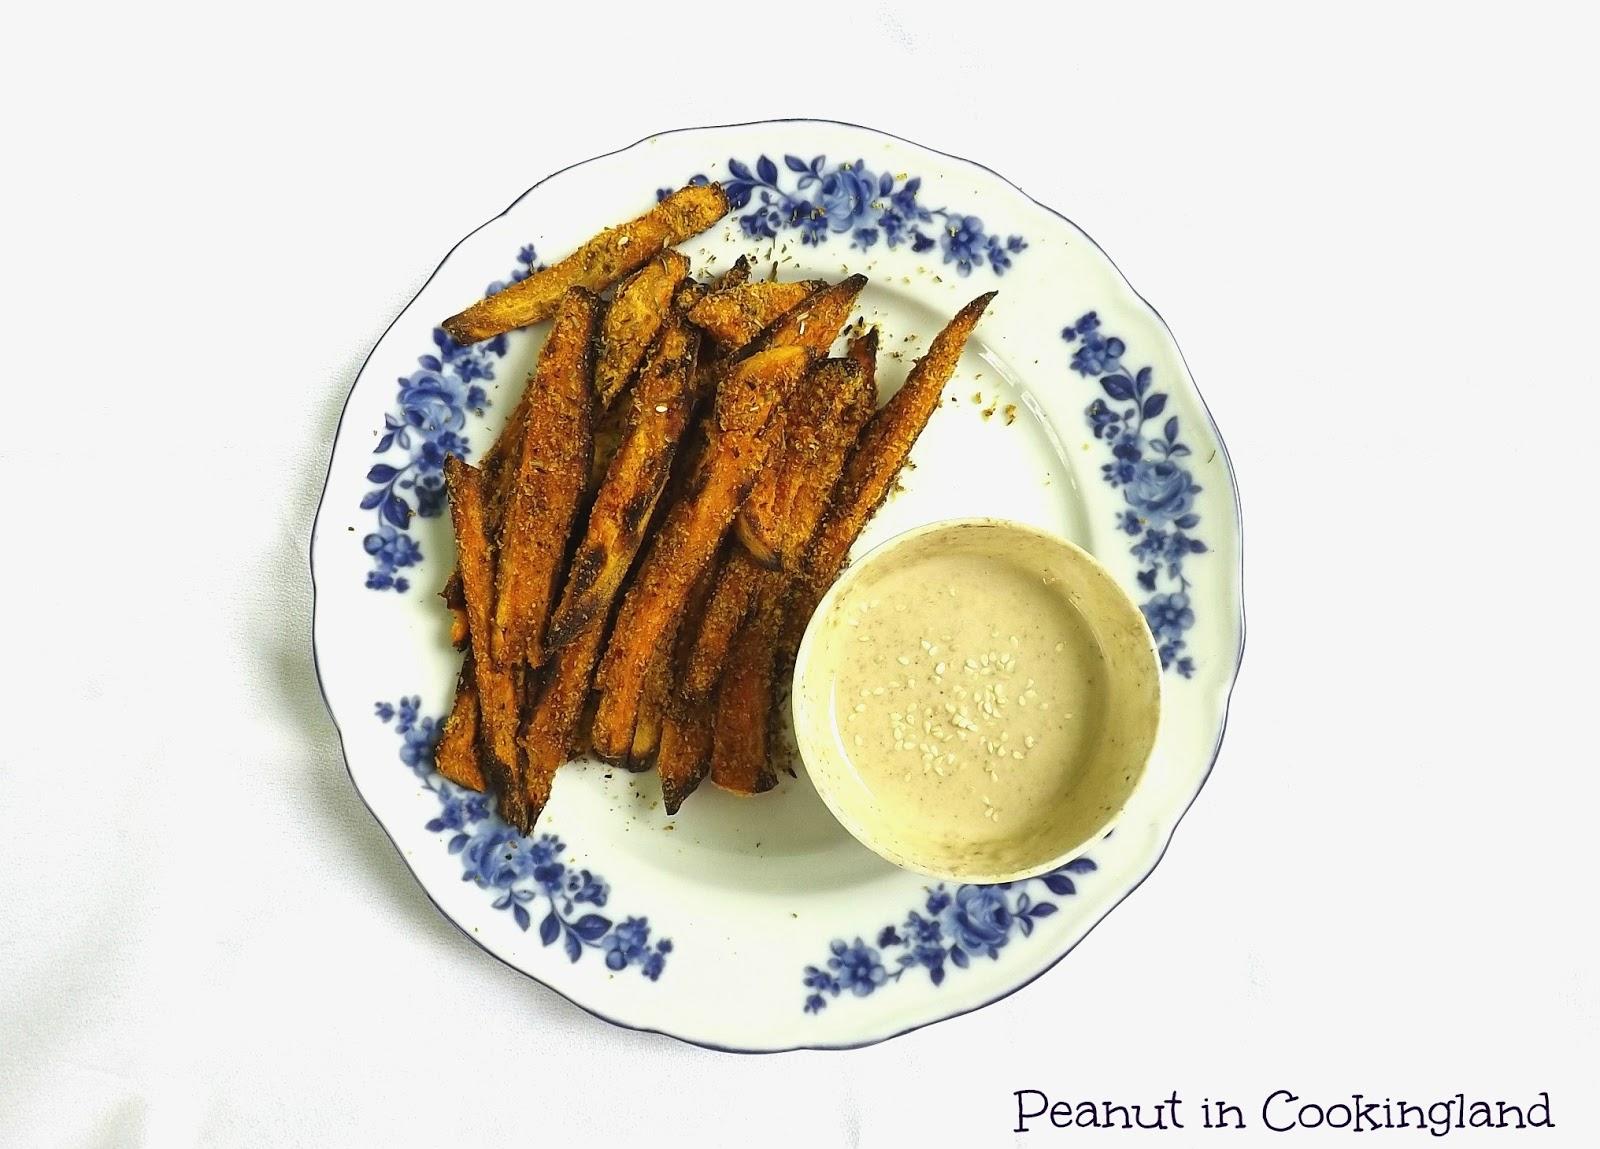 Sweet potato oven baked fries